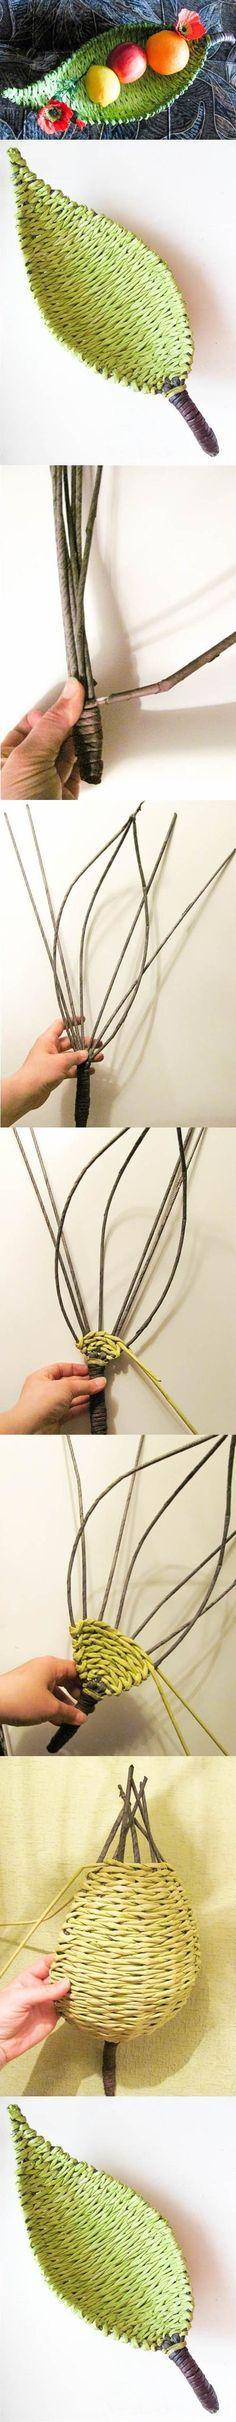 DIY Beautiful Paper Woven Tray | iCreativeIdeas.com Like Us on Facebook == https://www.facebook.com/icreativeideas